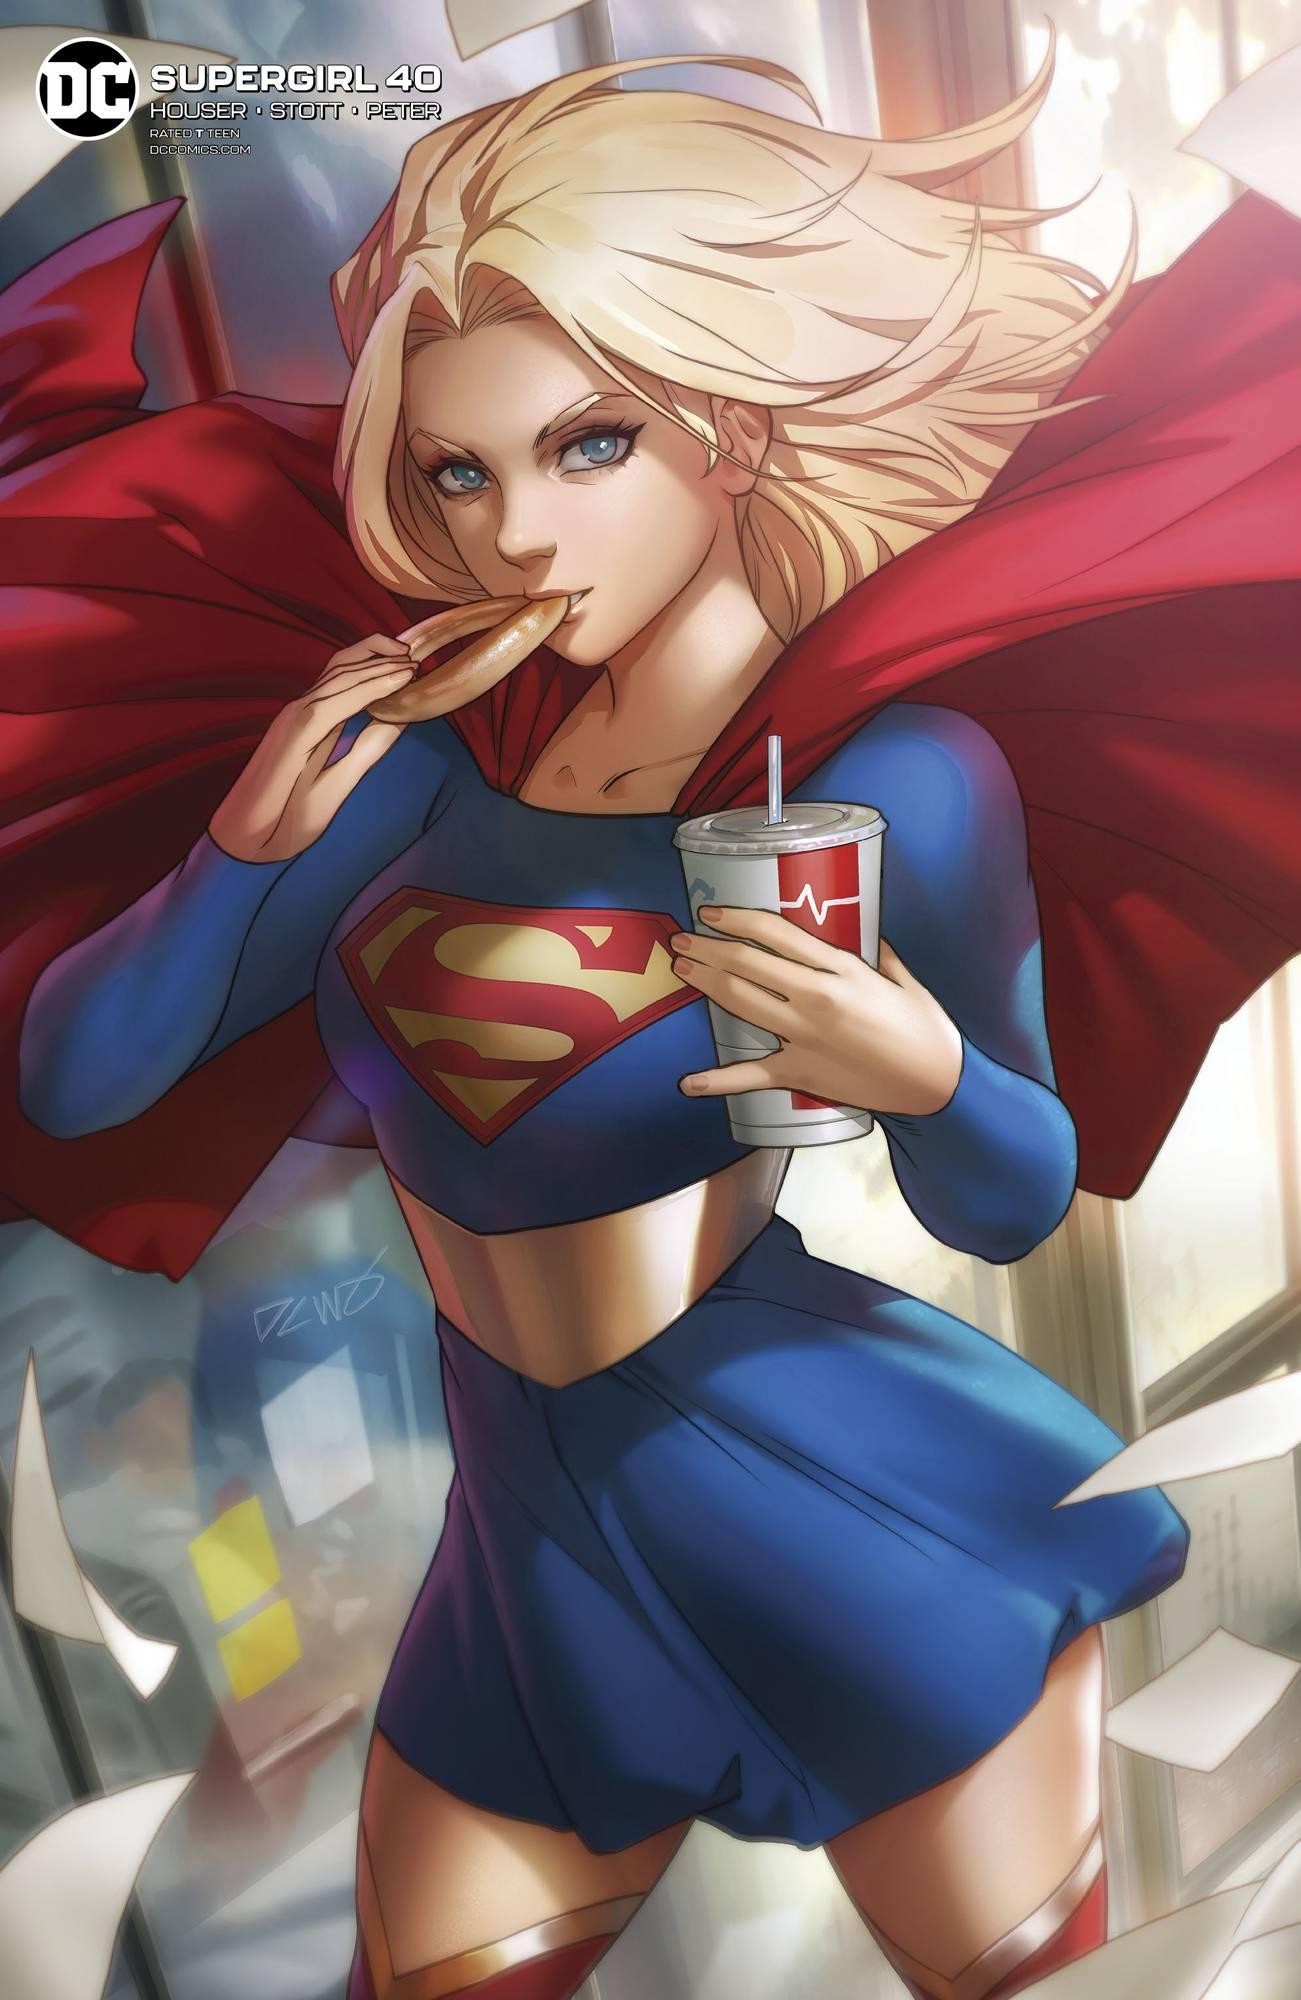 Supergirl #40 Card Stock Derrick Chew Var Ed